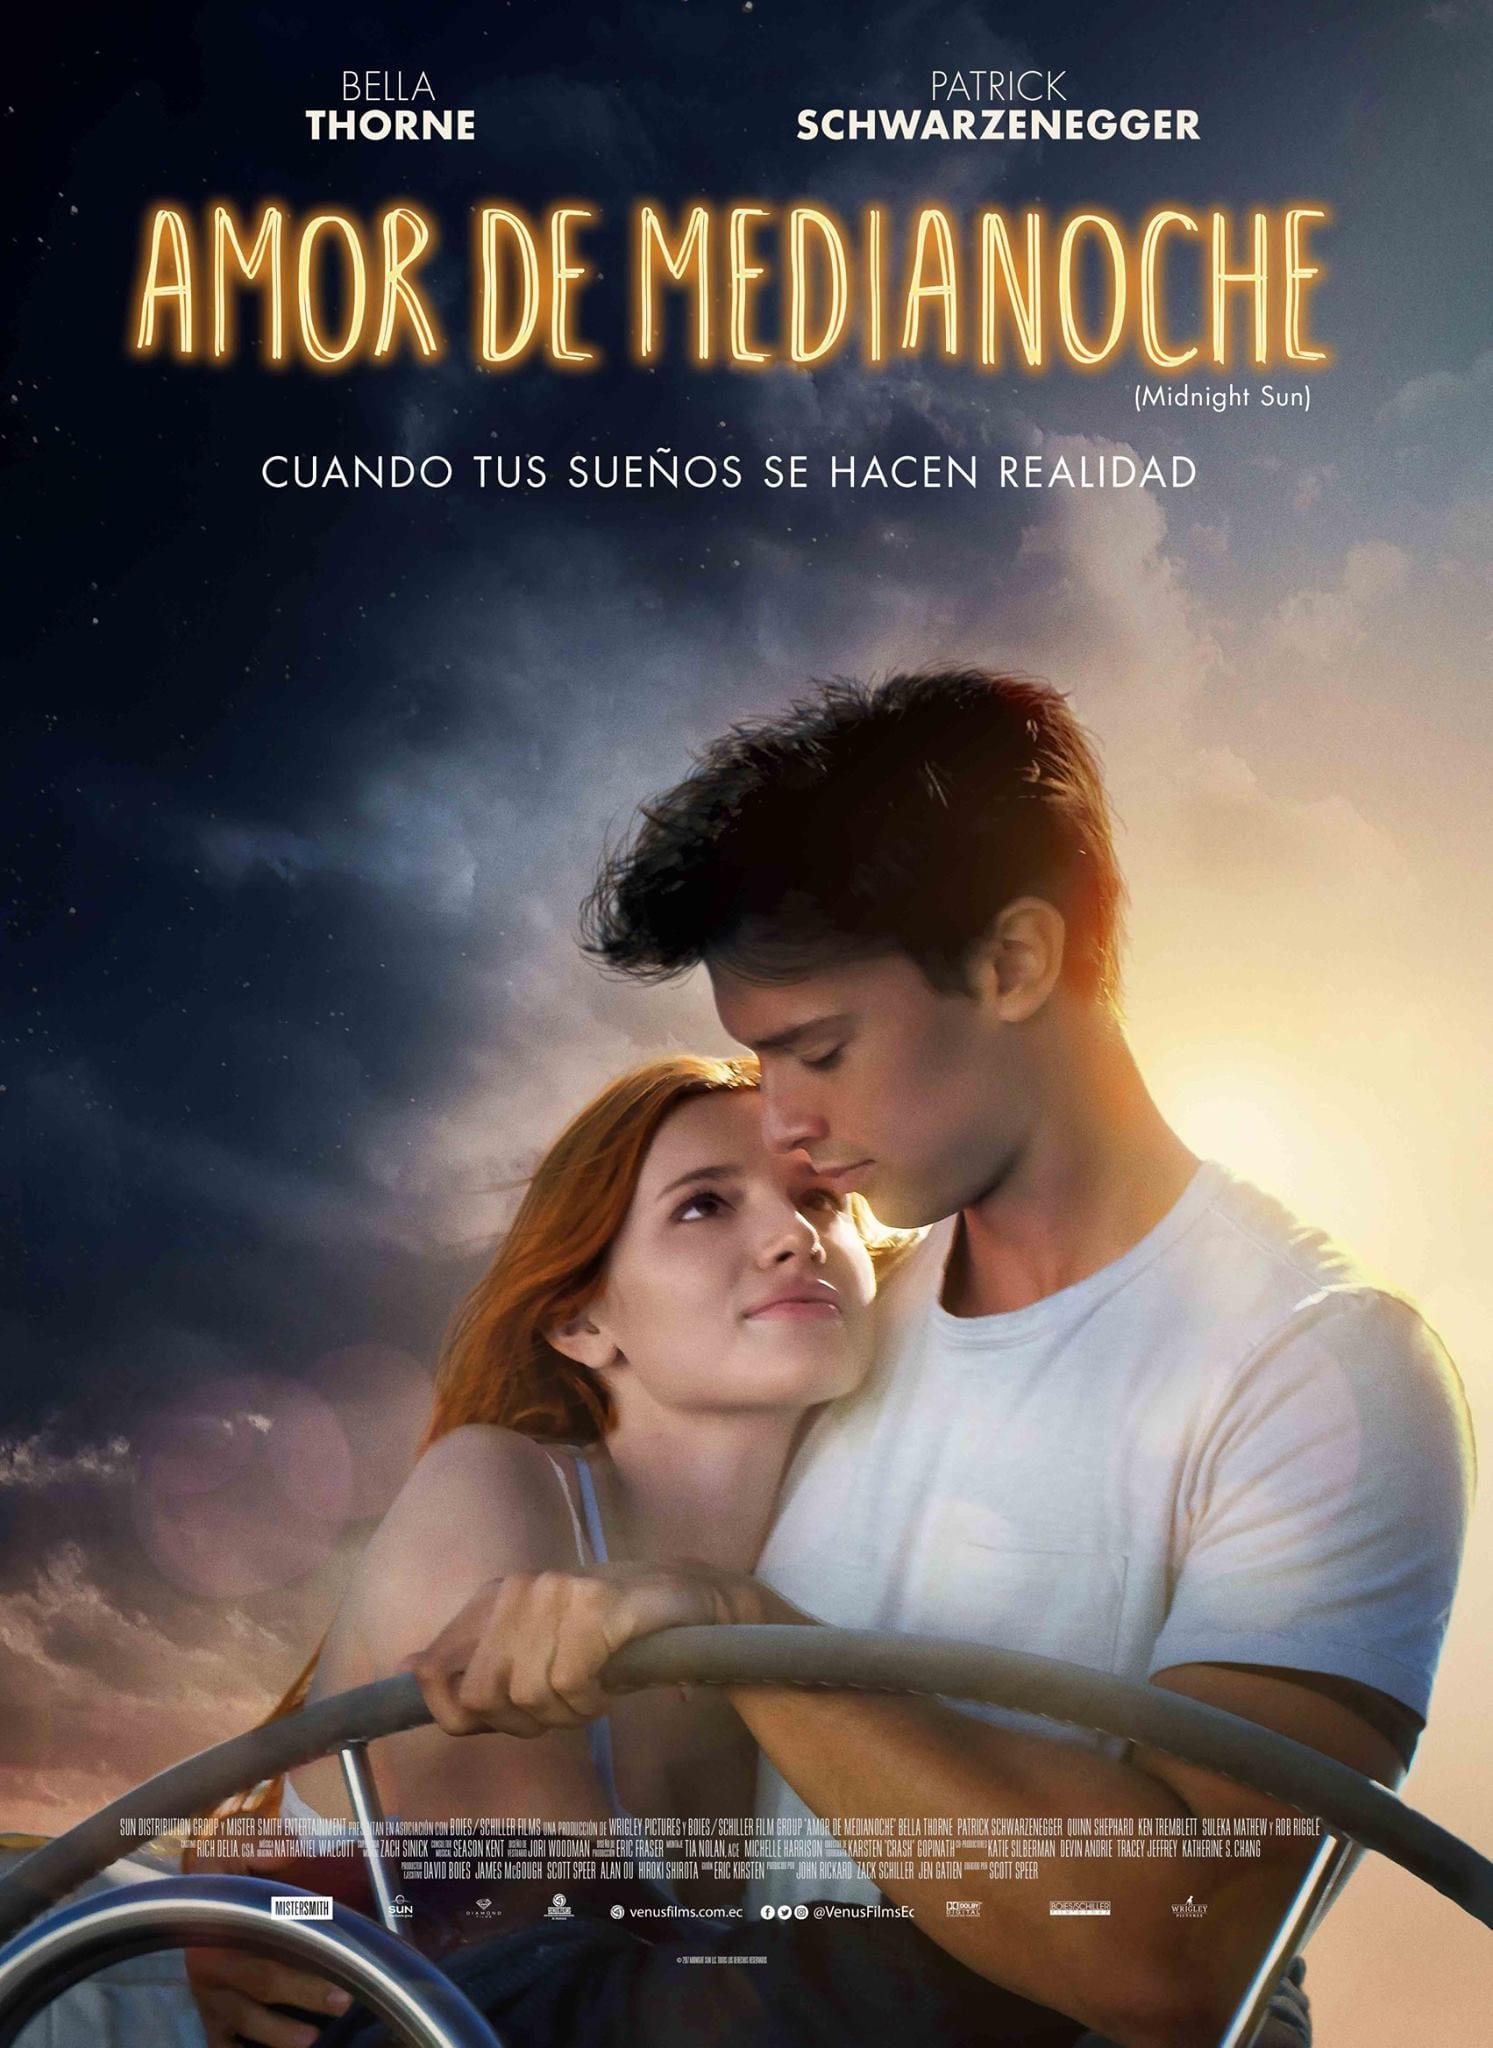 Crítica de cine: Amor a medianoche